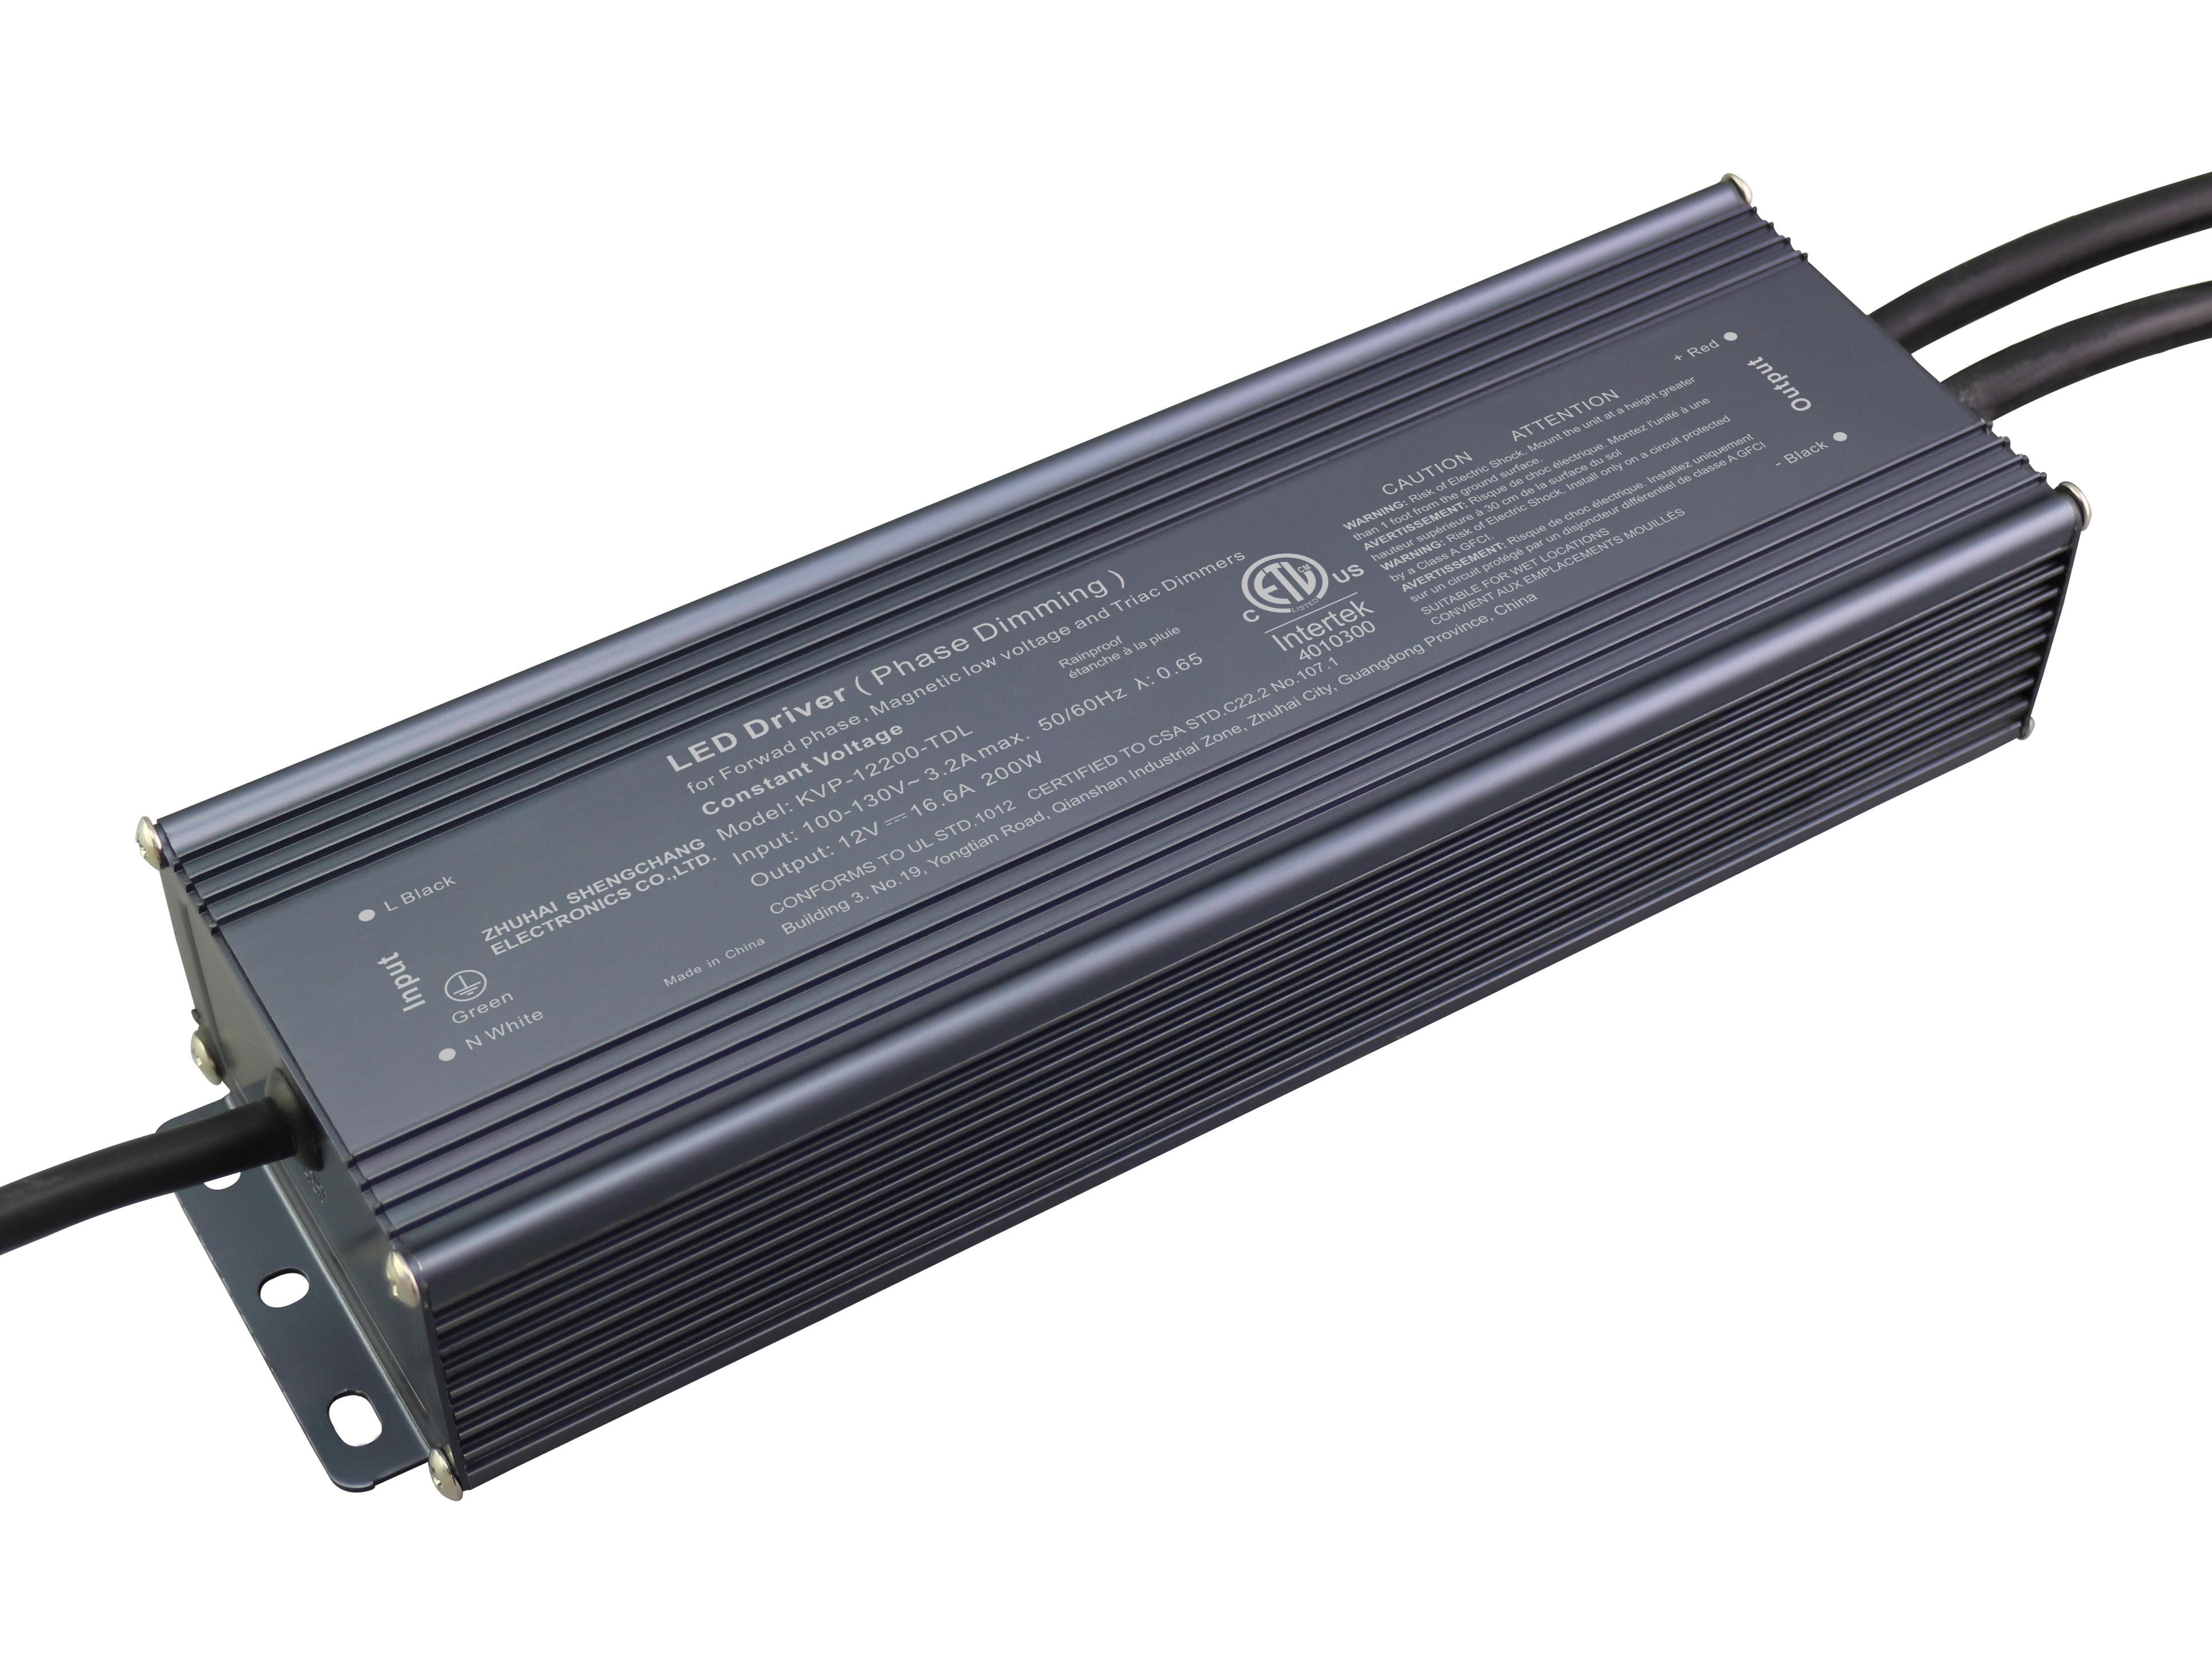 120VAC KVP series 200W constant voltage triac LED driver